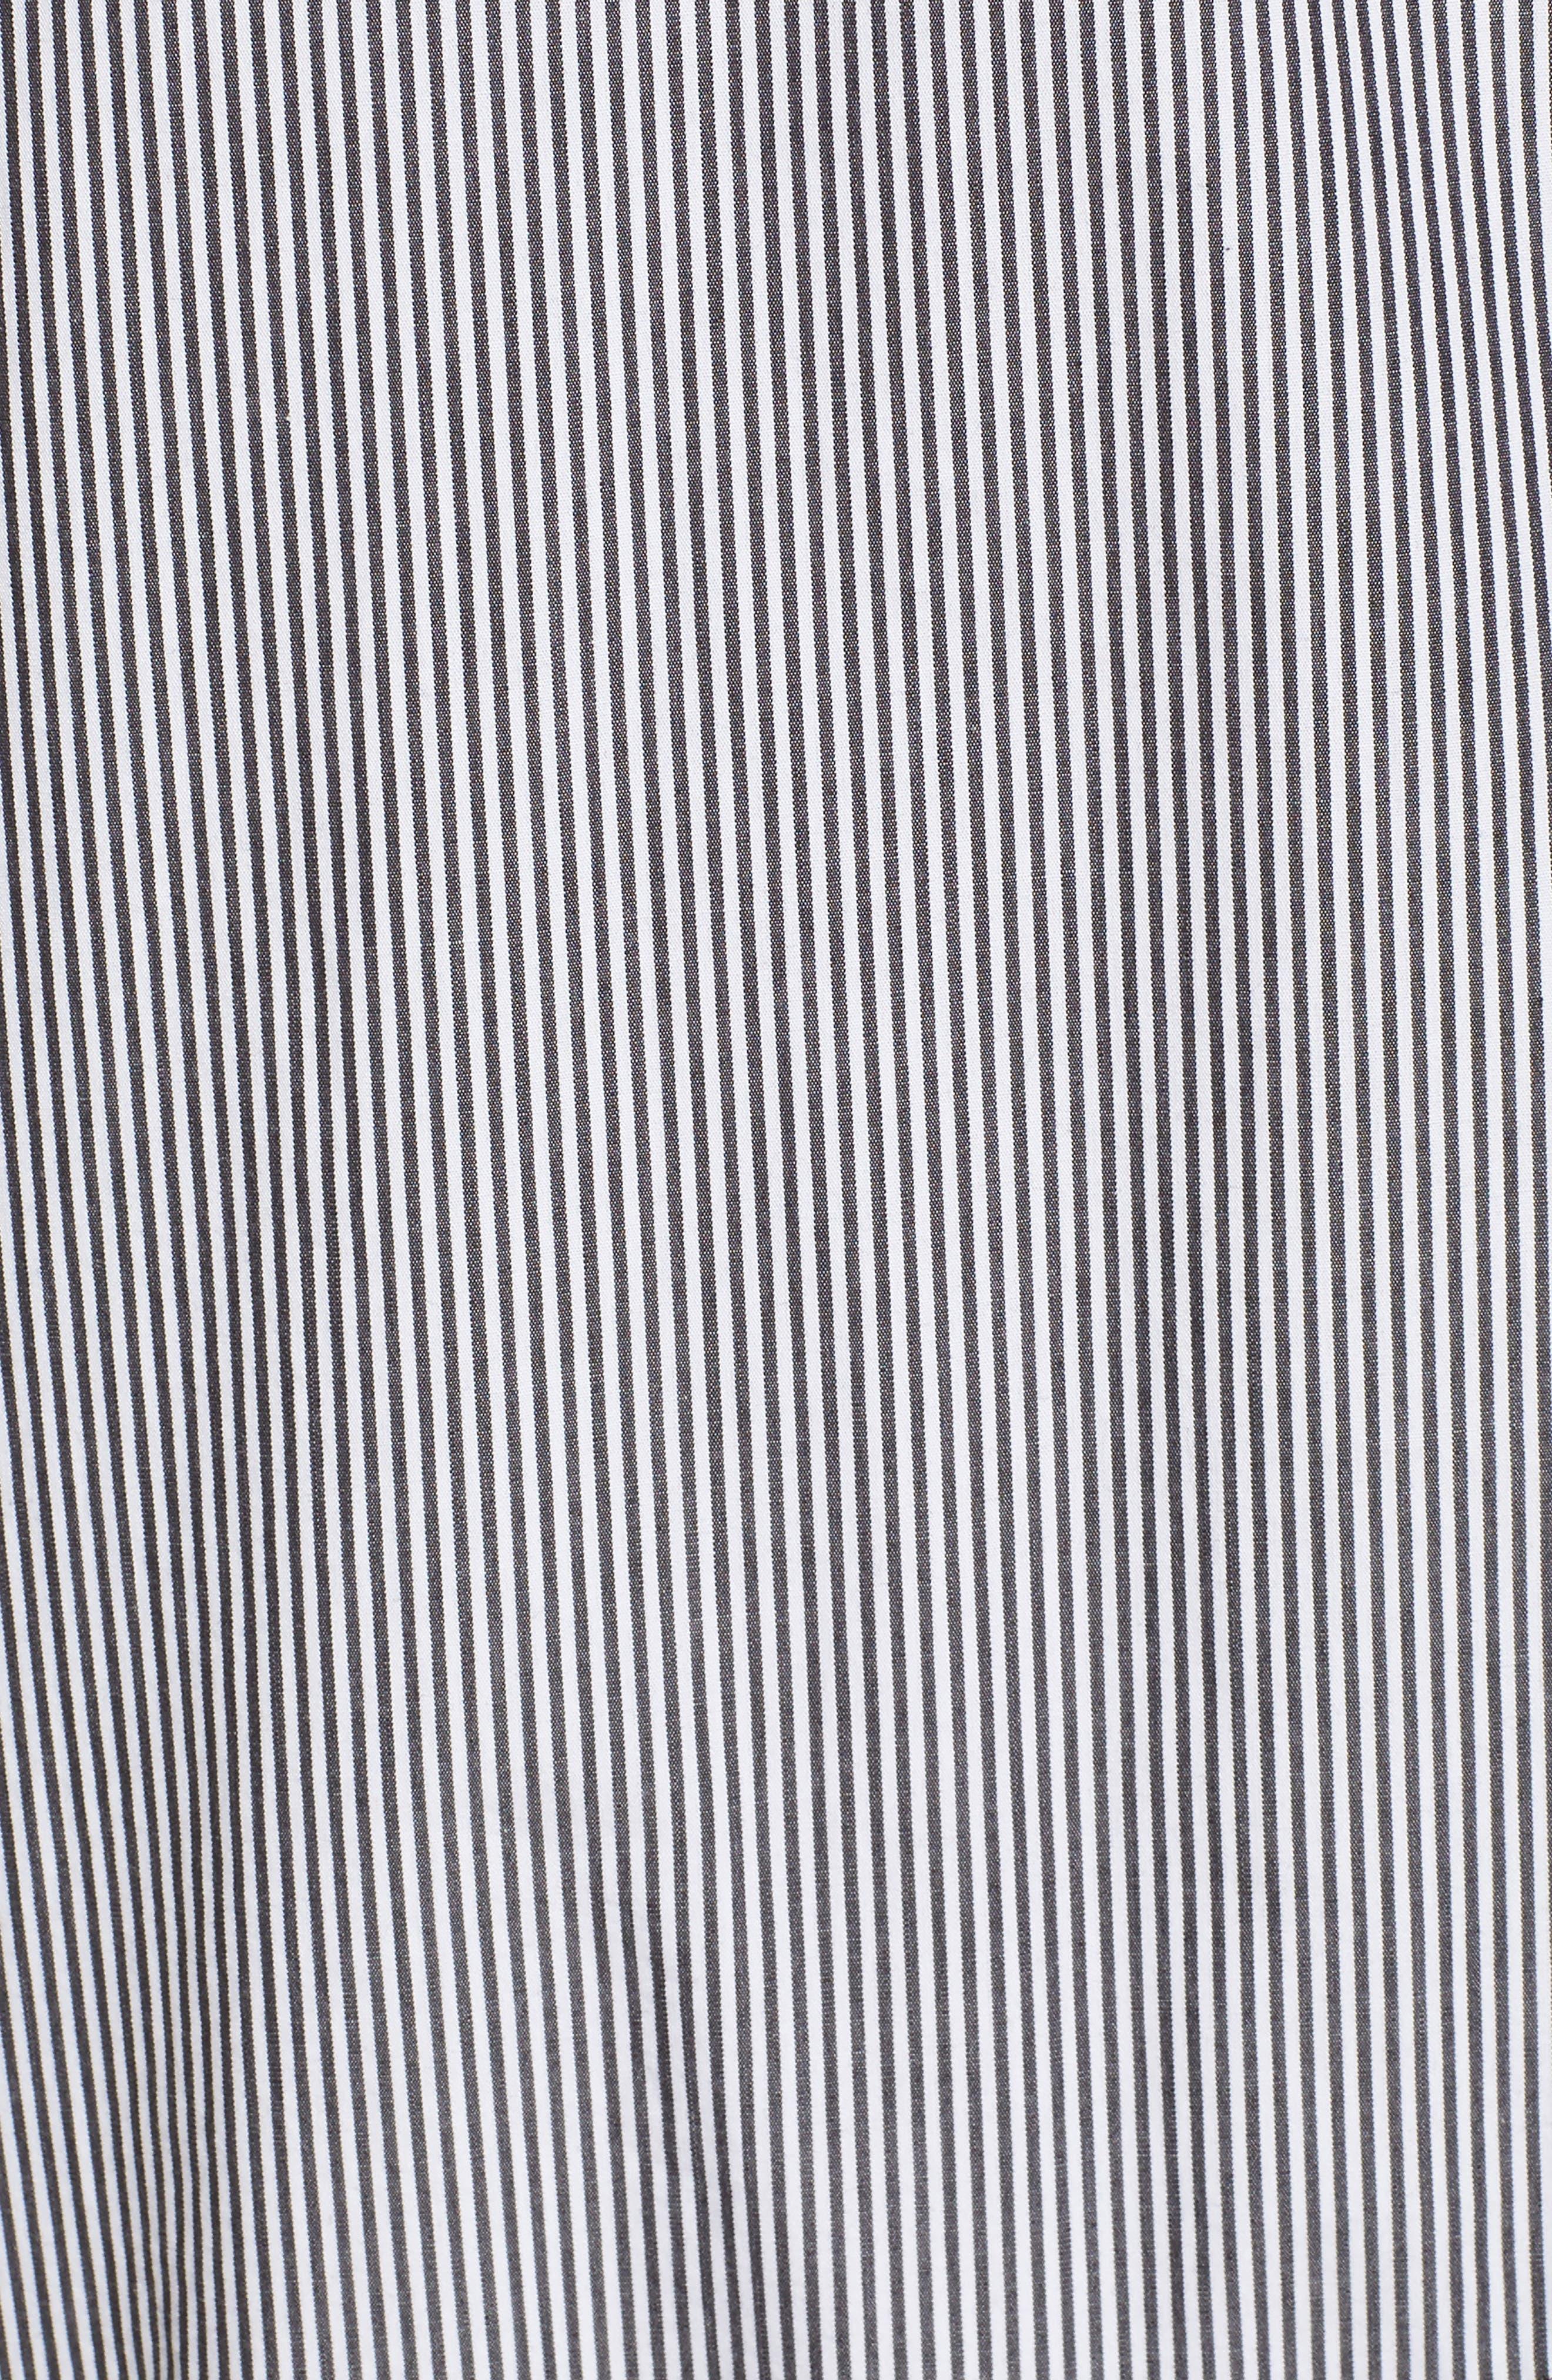 Lace Trim Drop Waist Dress,                             Alternate thumbnail 5, color,                             Black Jenny Stripe